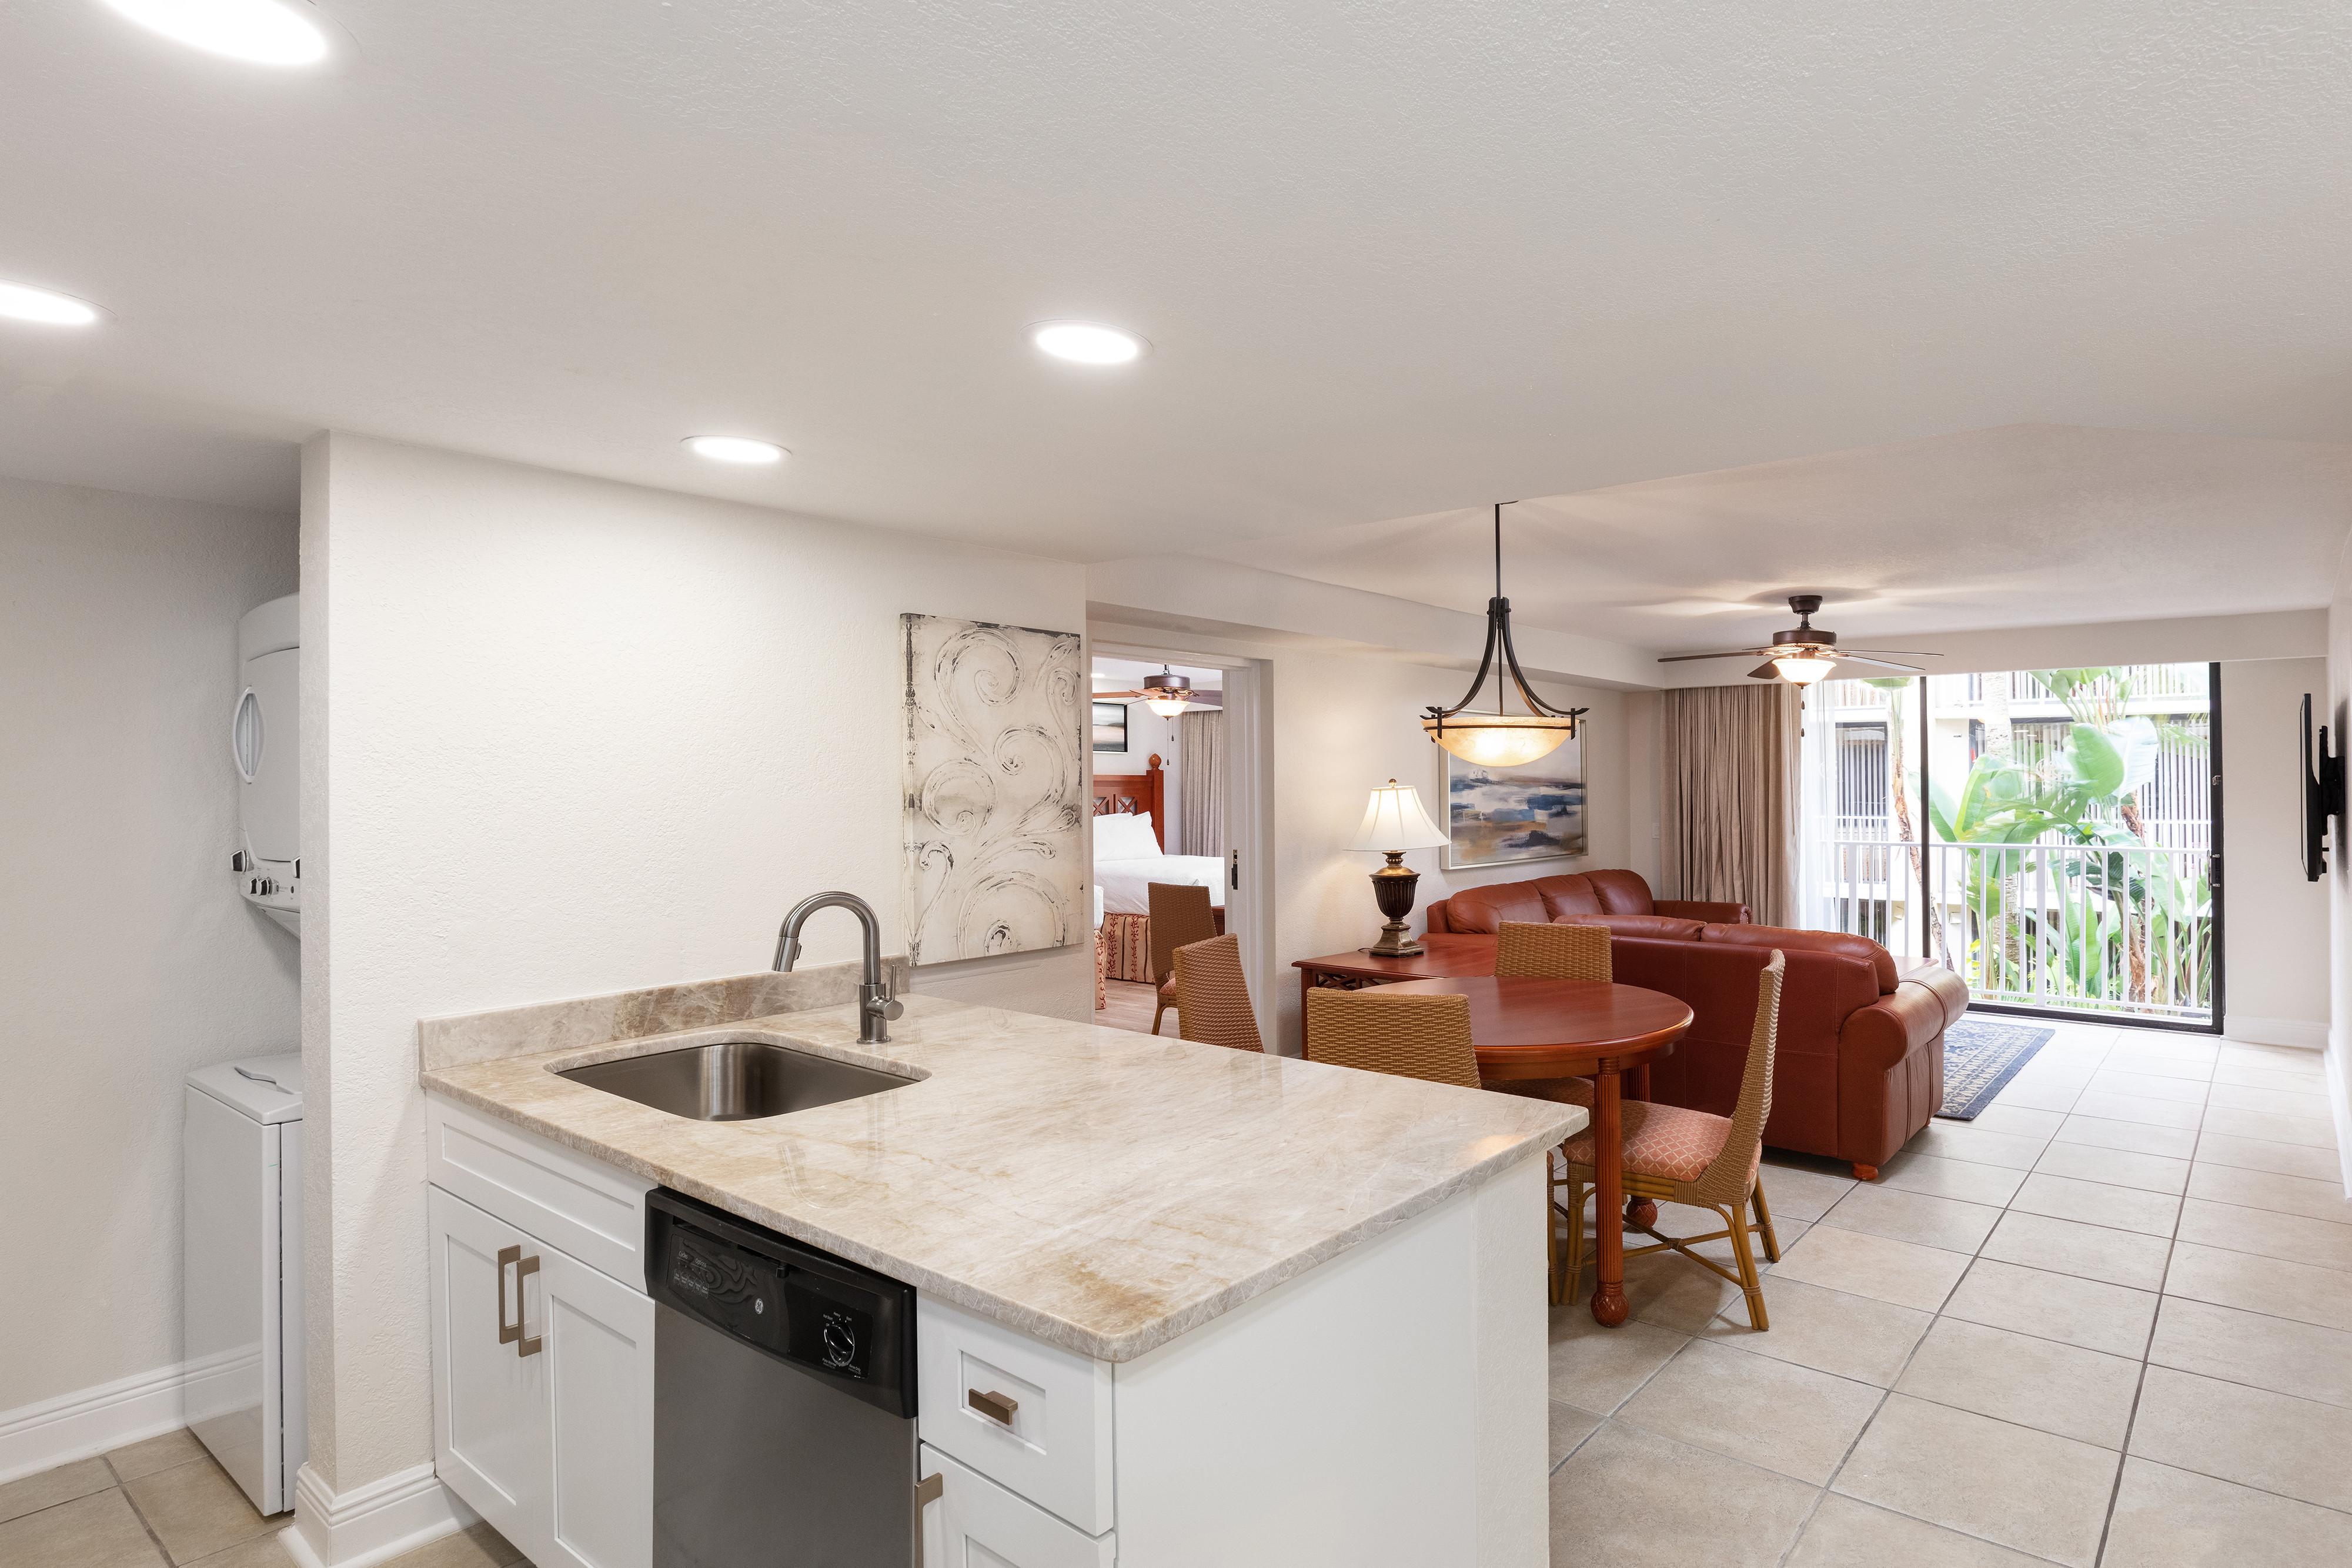 Two-Bedroom Villa at our hotel villas in Orlando Florida | Westgate Towers Resort | Westgate Resorts